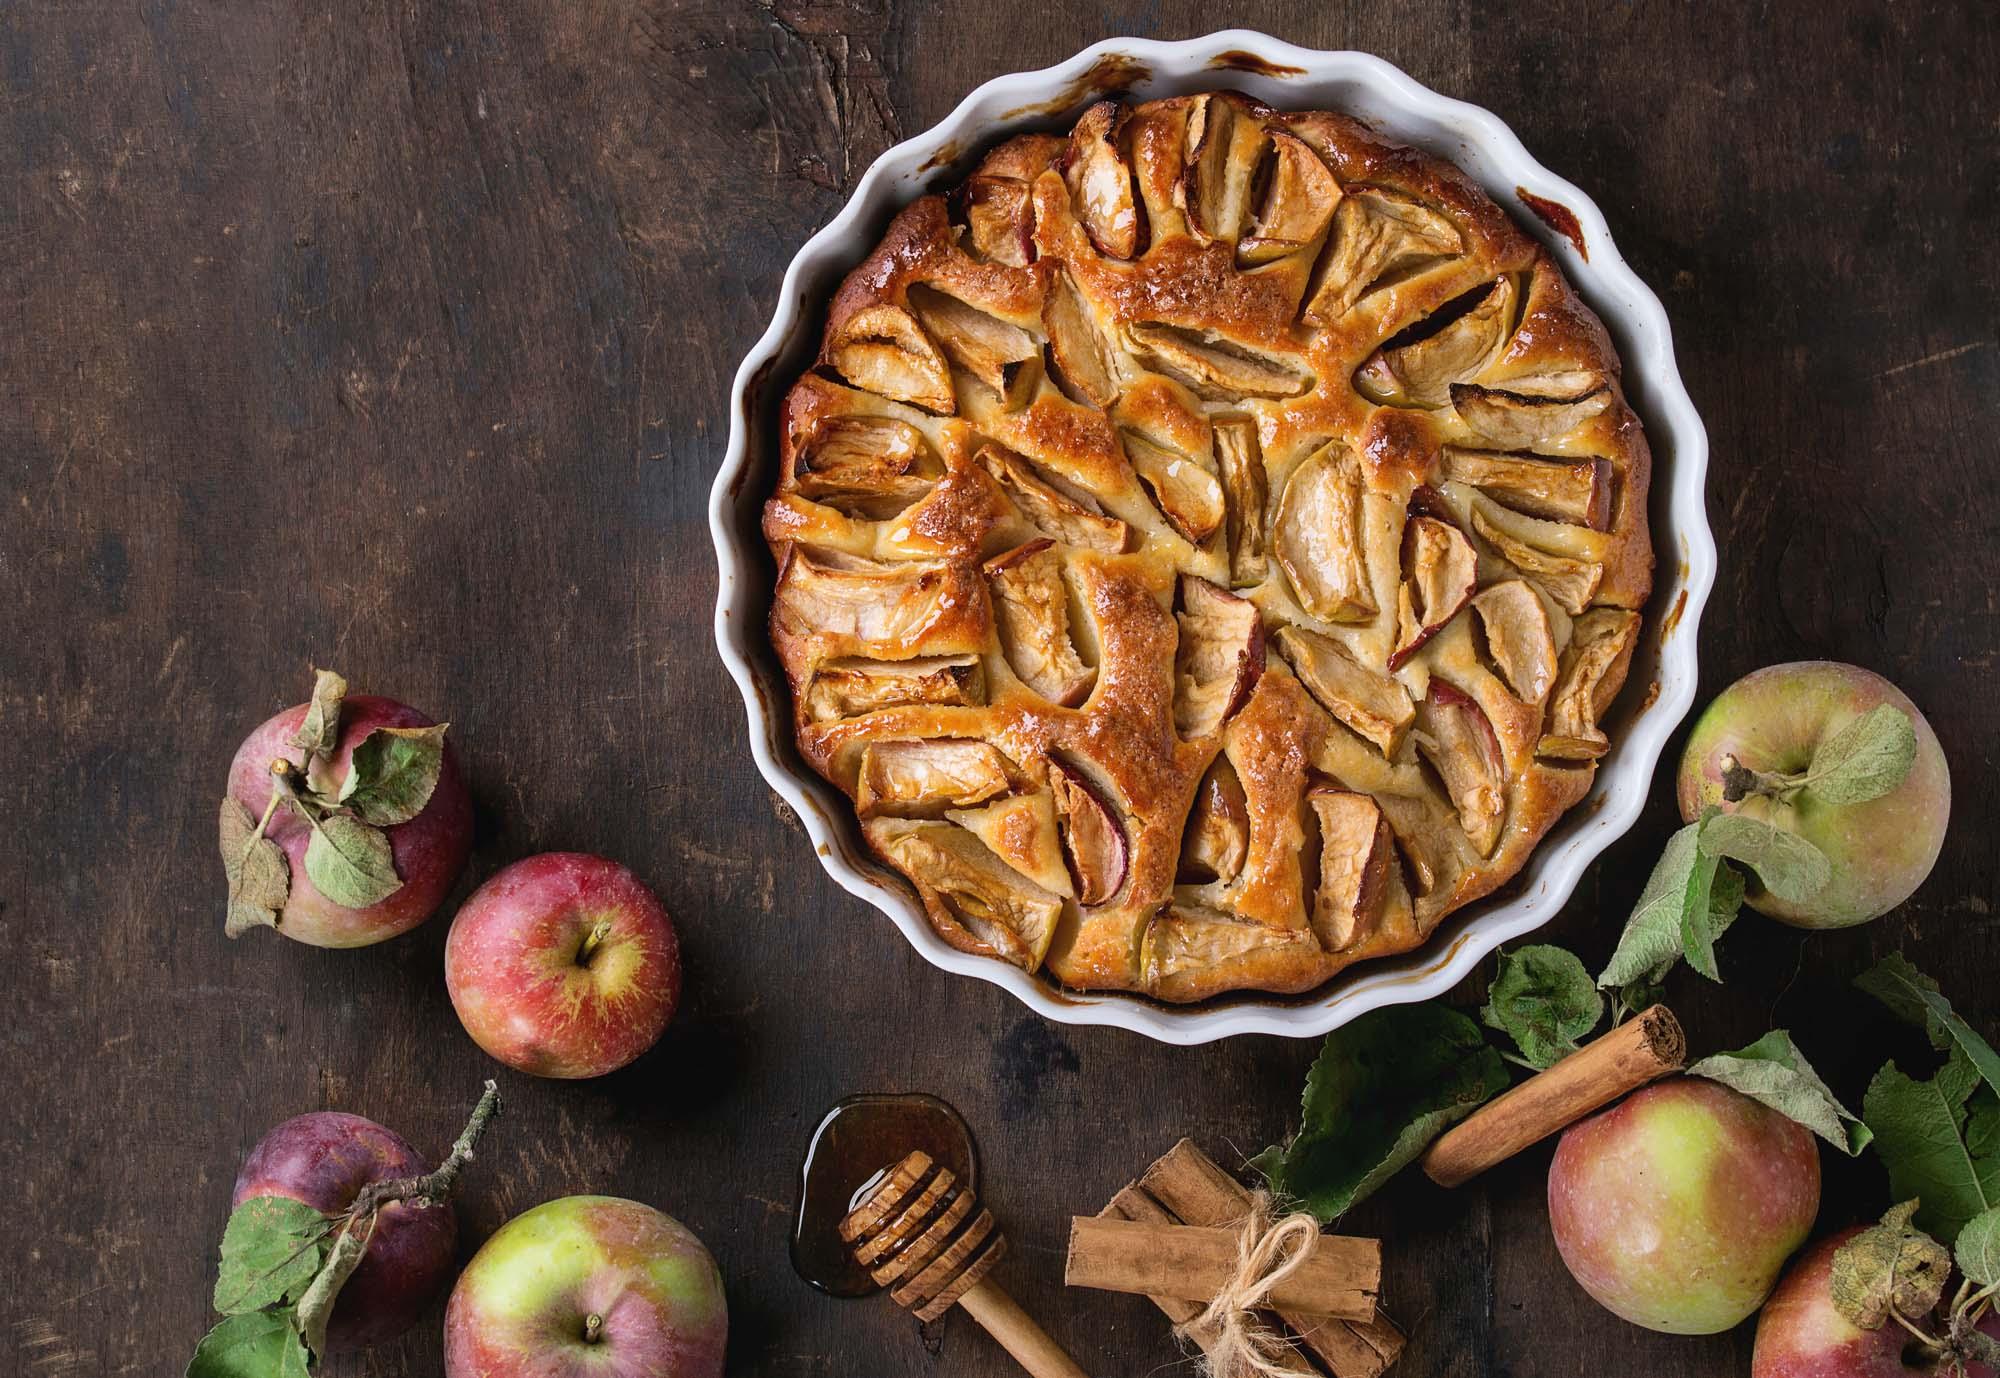 Æblekage familiejournal